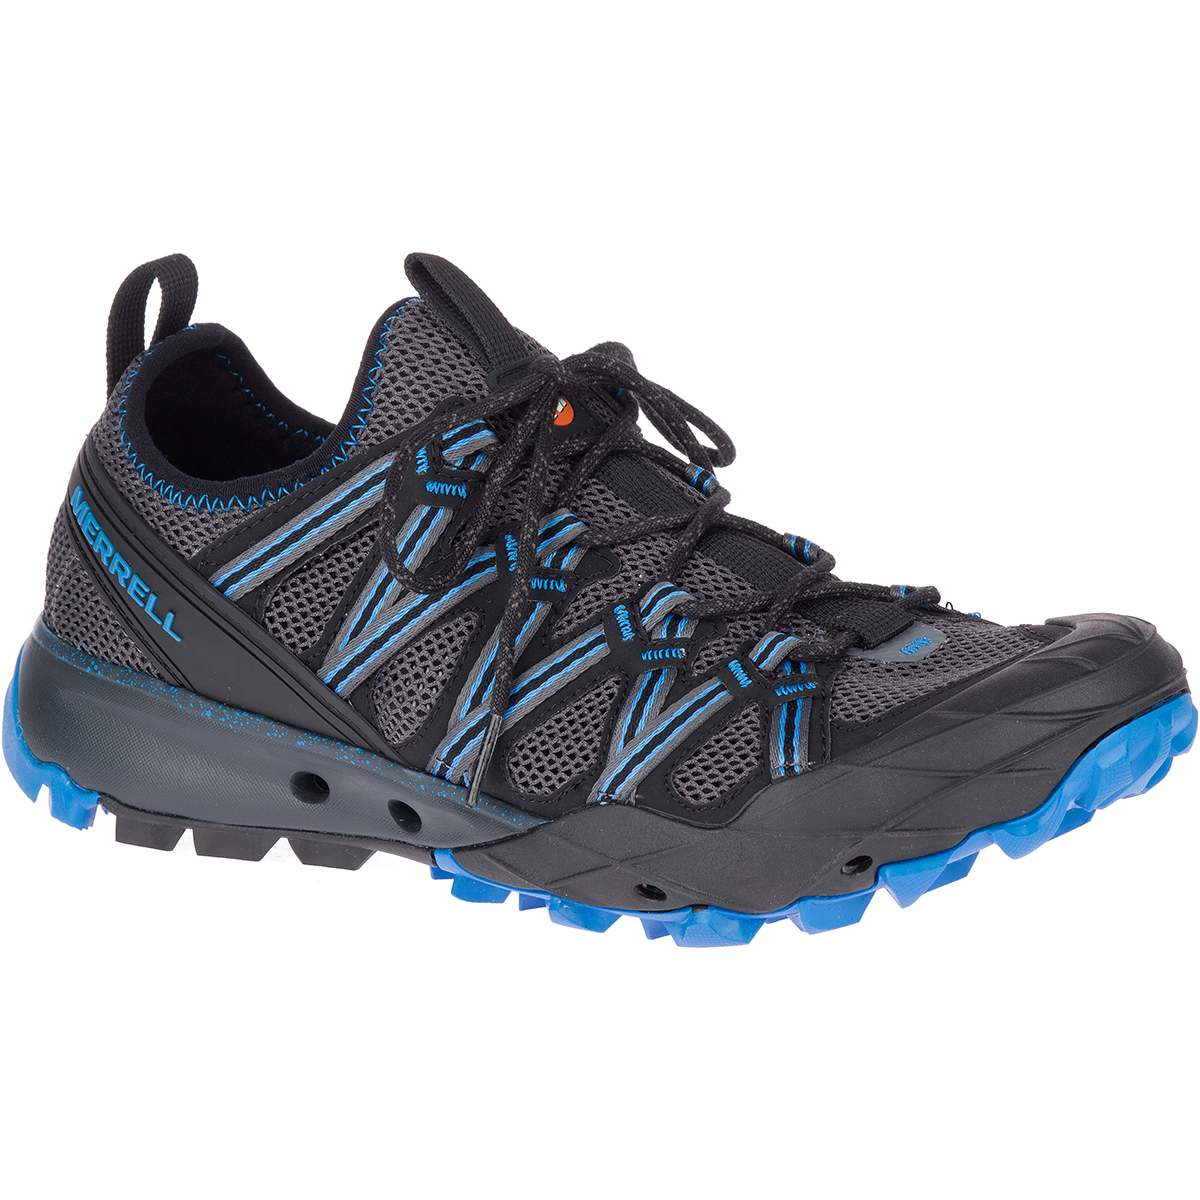 Merrell Men's Choprock Hiking Shoe - Black, 11